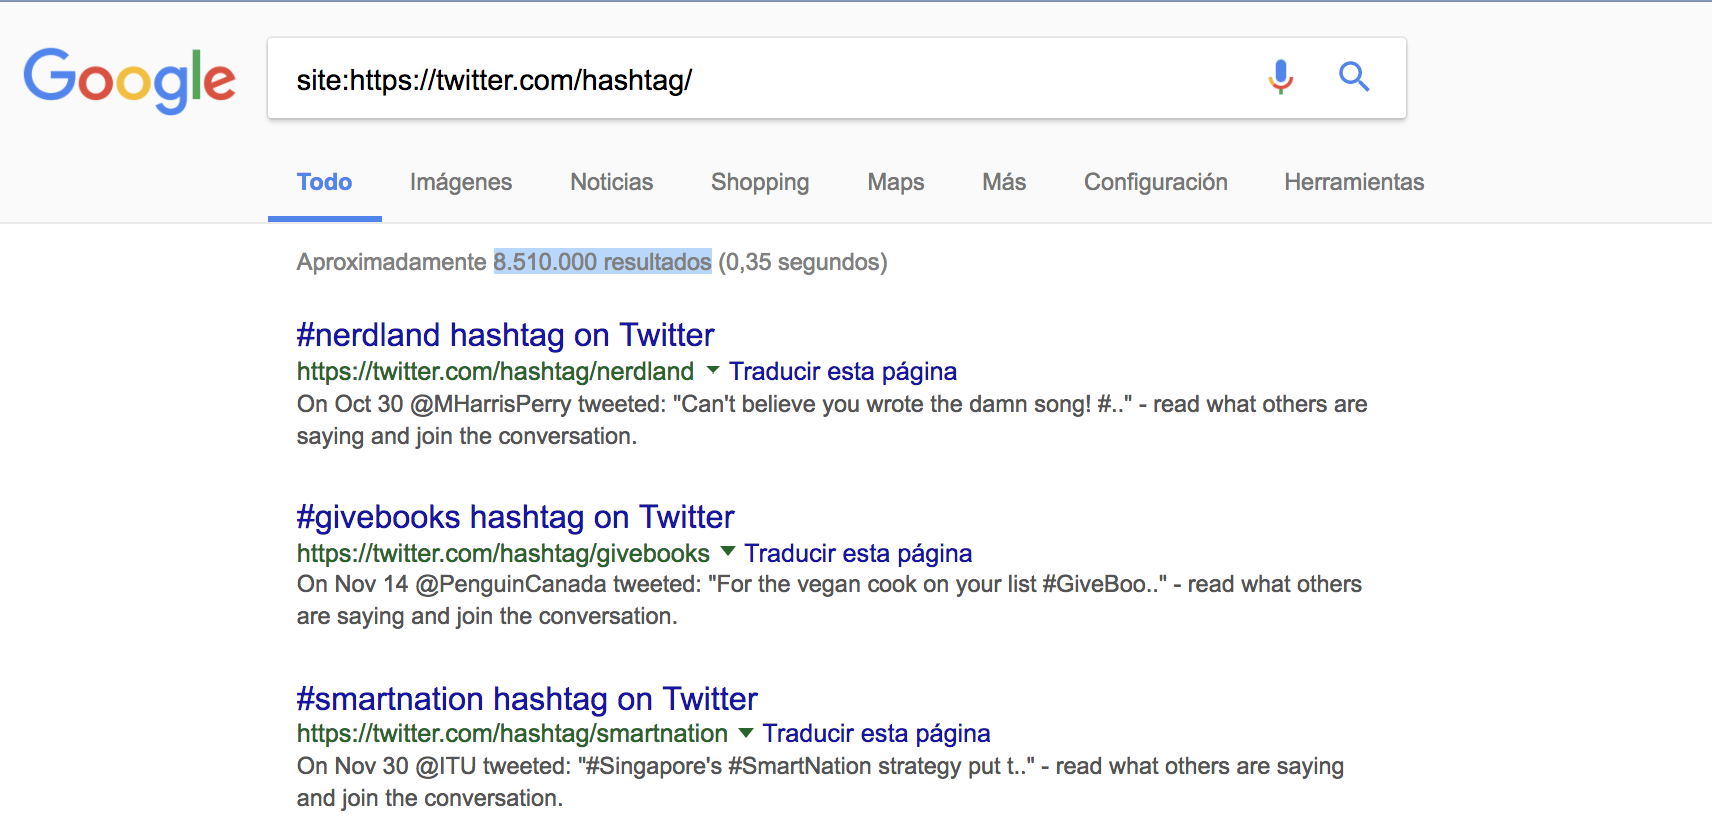 SEO en redes sociales - URLs indexadas en Google España